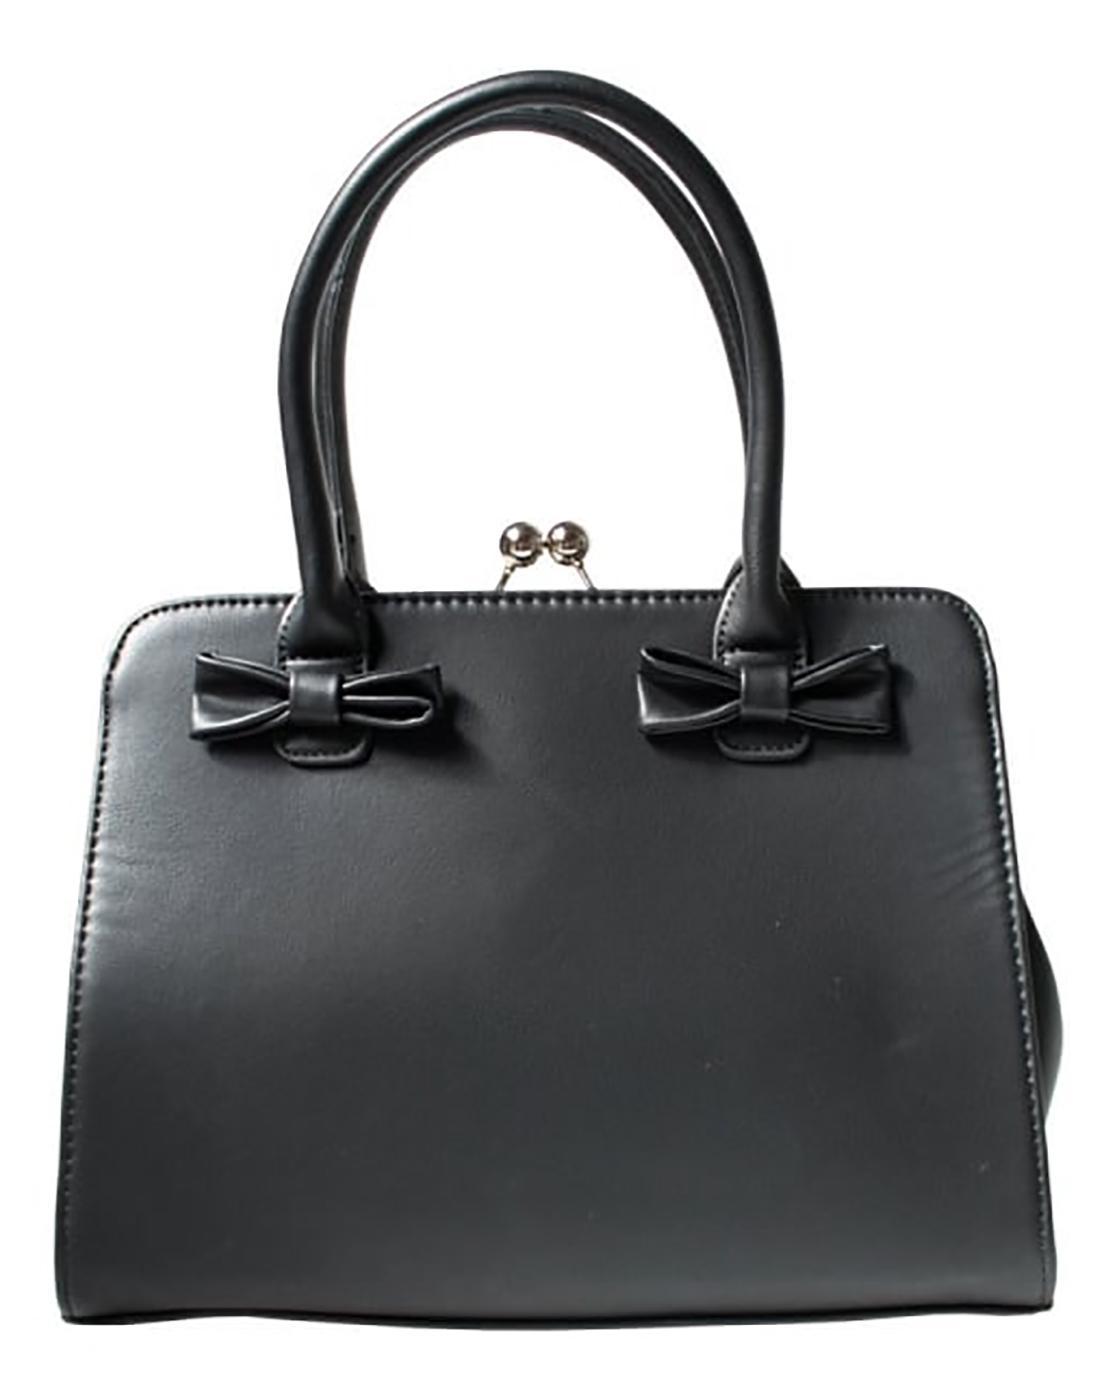 Jessica COLLECTIF Retro 1950s Bow Handbag in Black